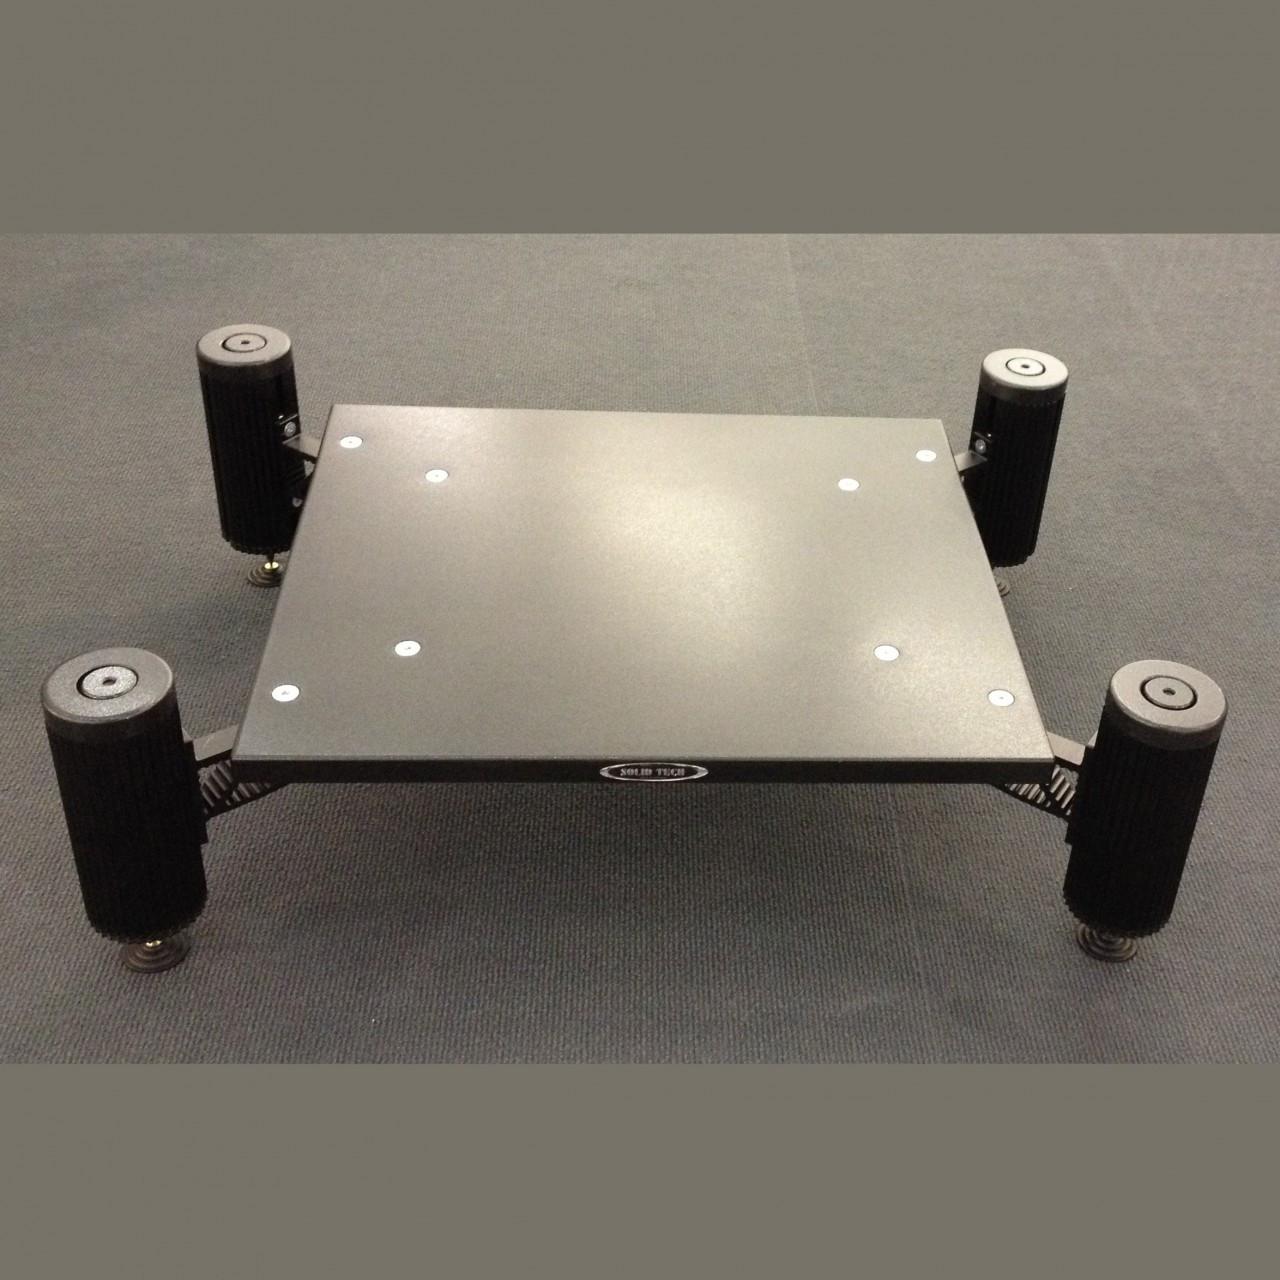 Solid Tech Hybrid rack system